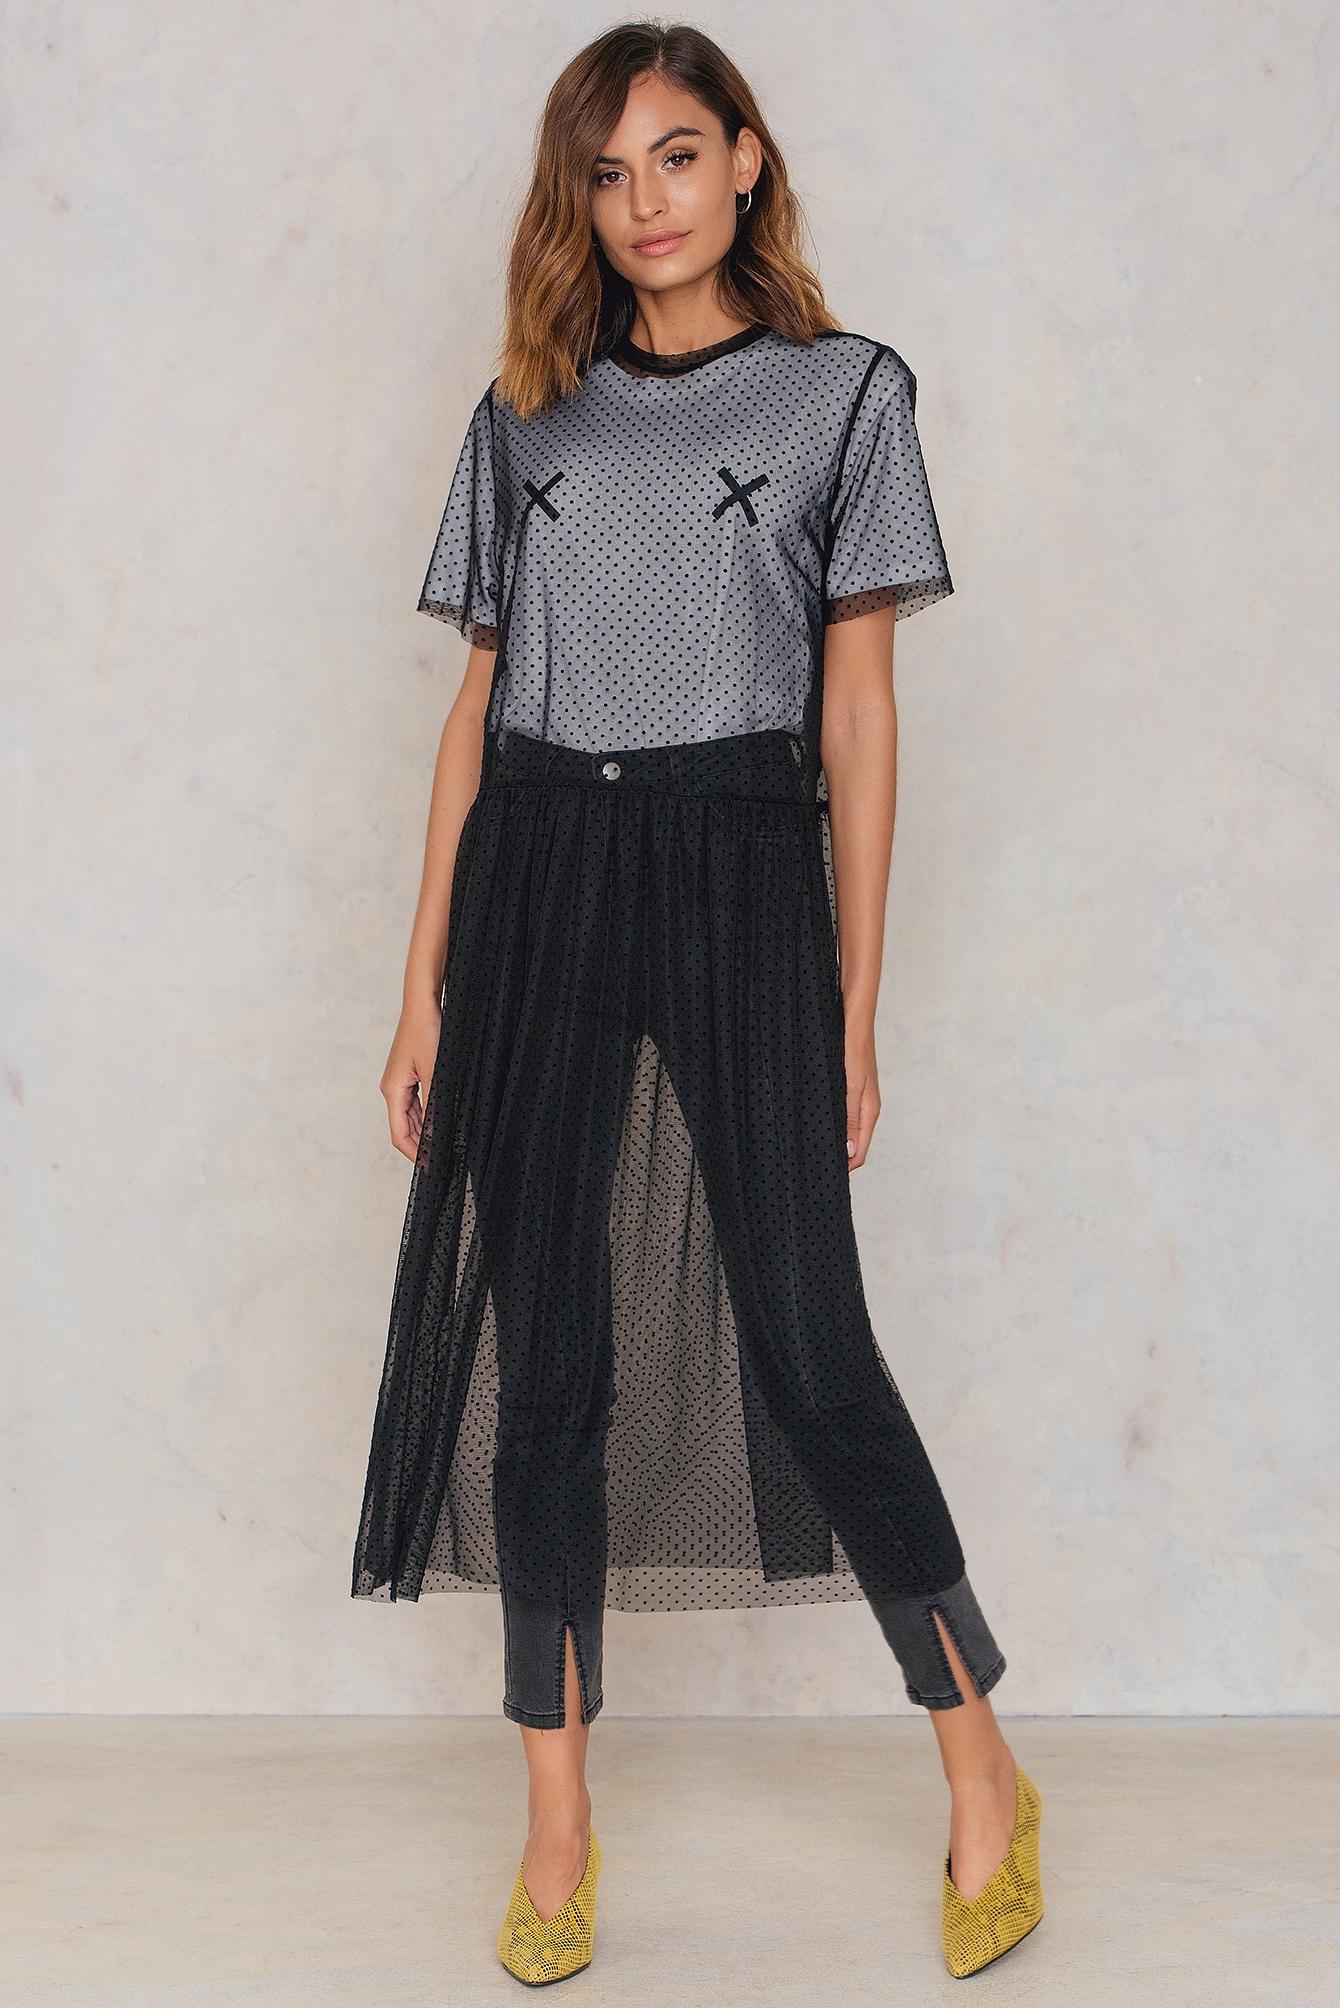 NA-KD Trend Dotted Mesh Midi Dress Black by NA-KD Trend